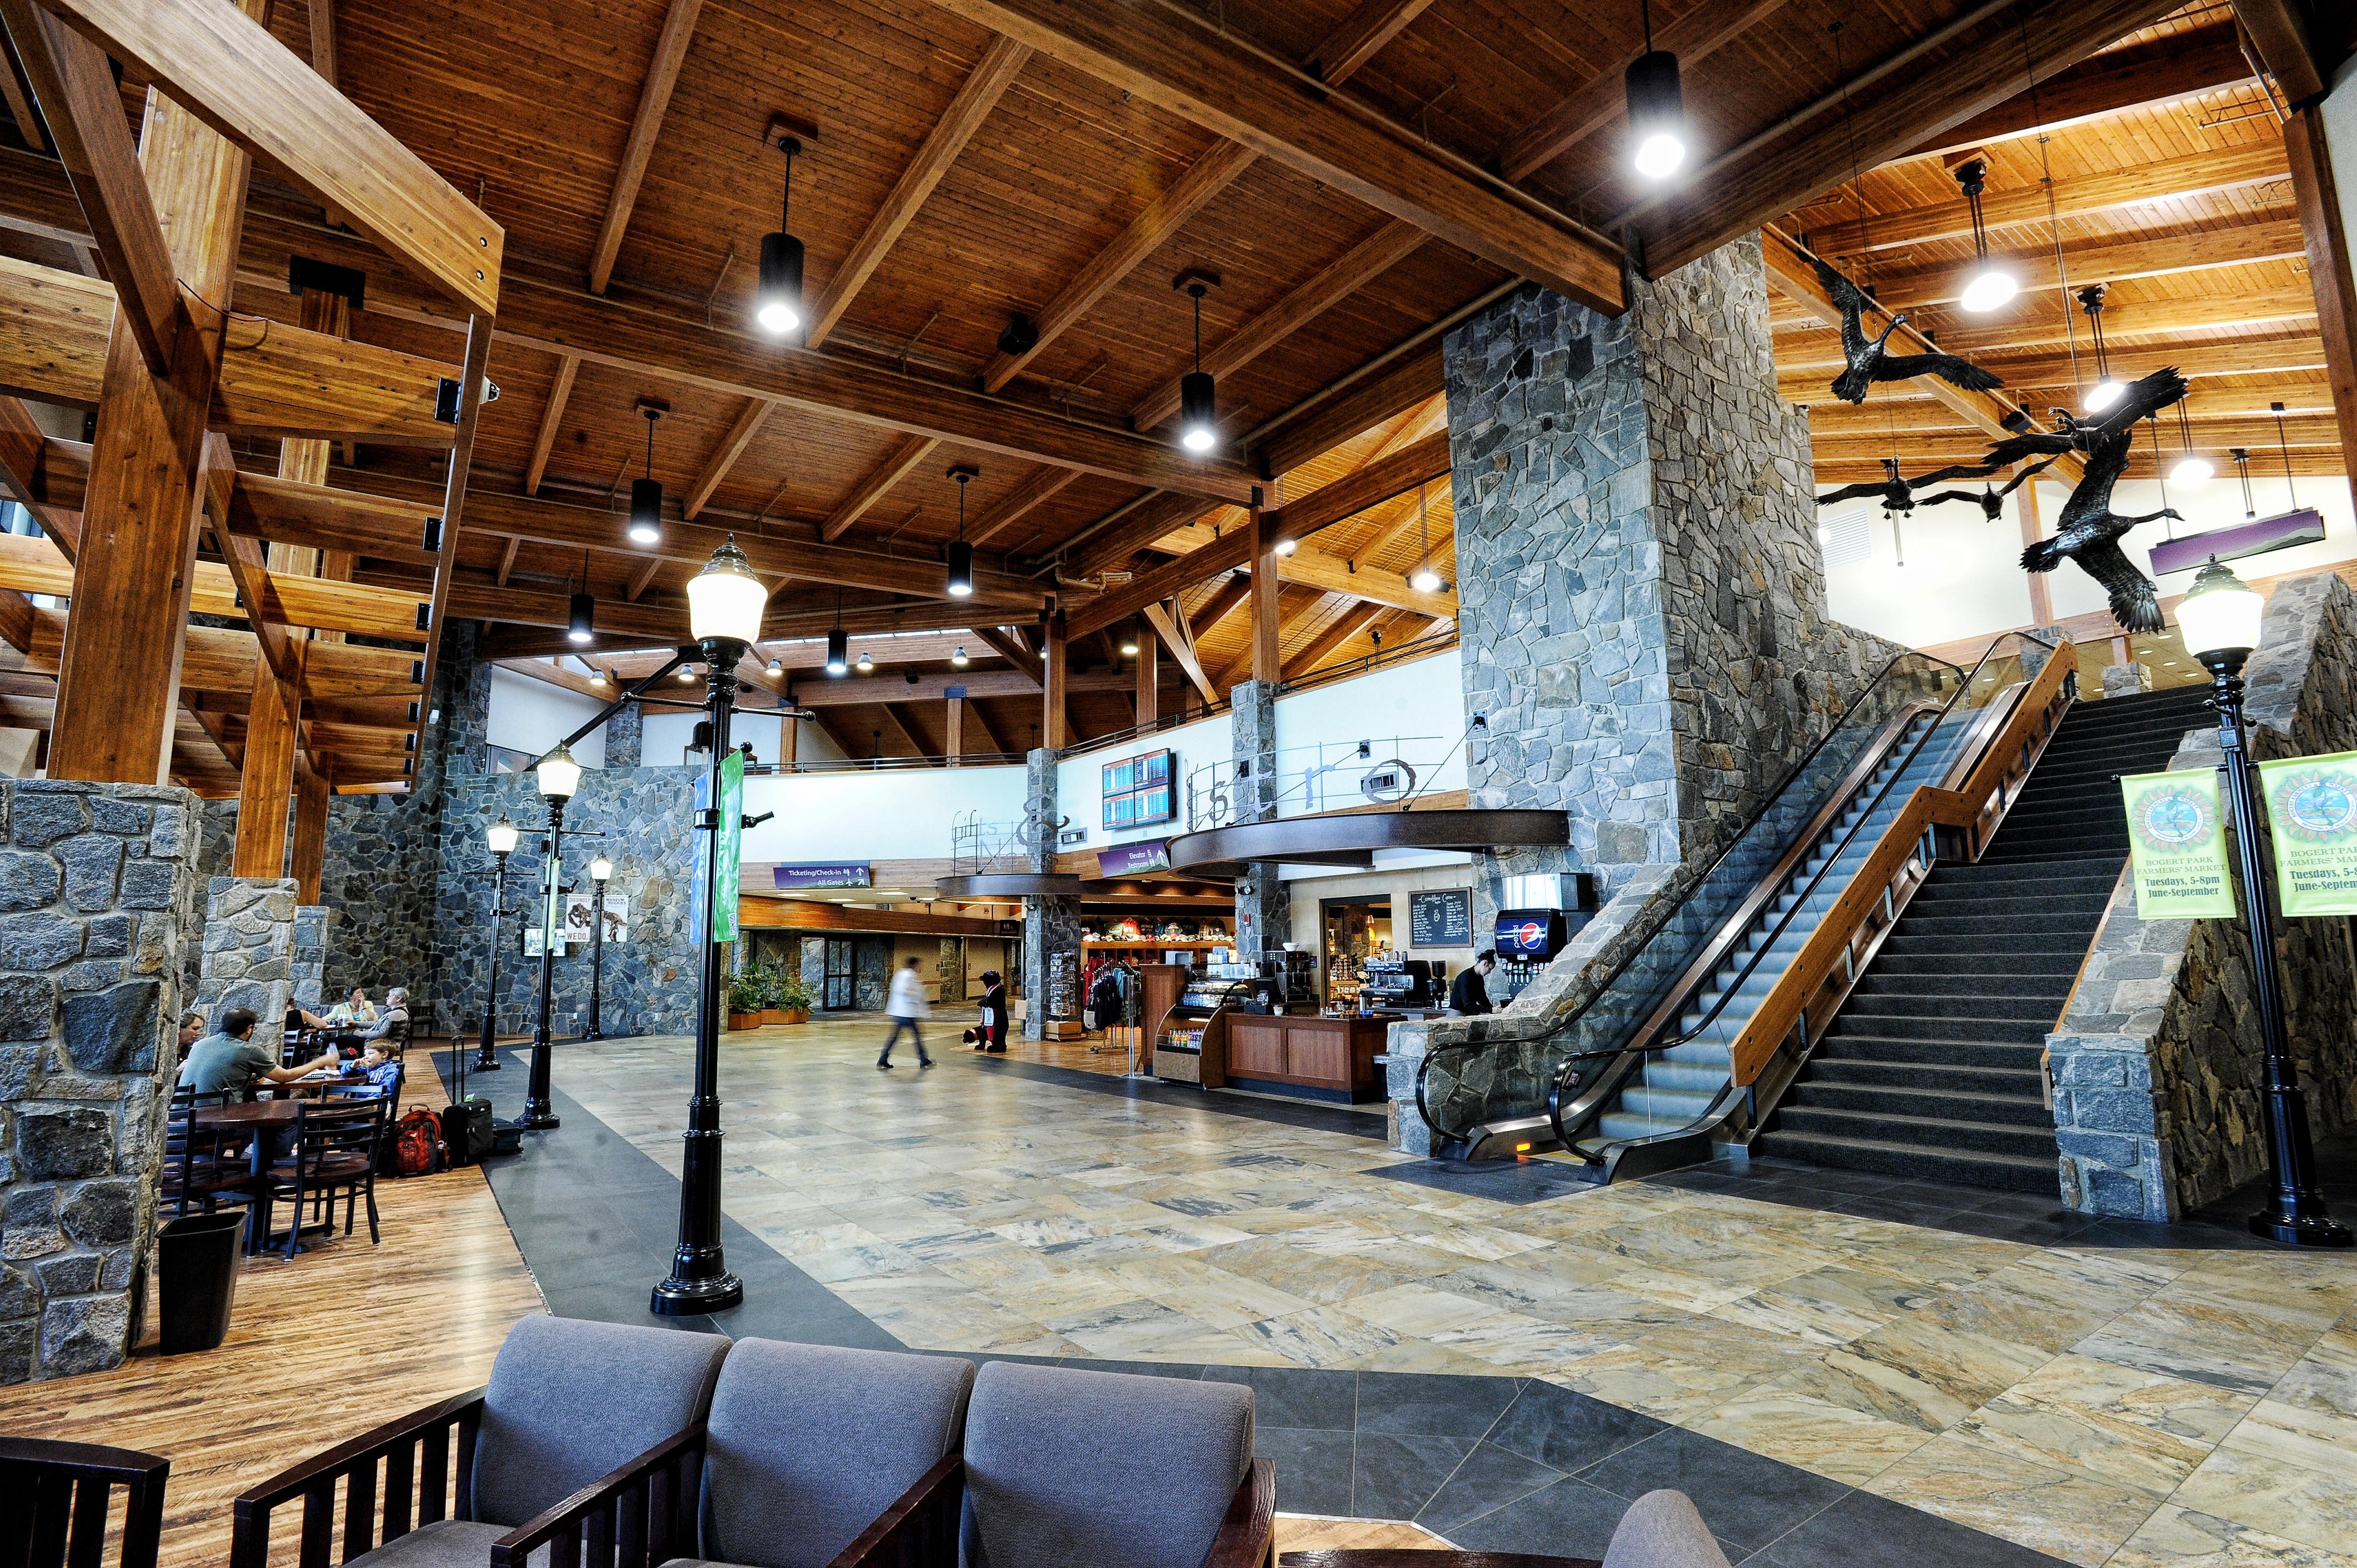 Bozeman Yellowstone International Airport